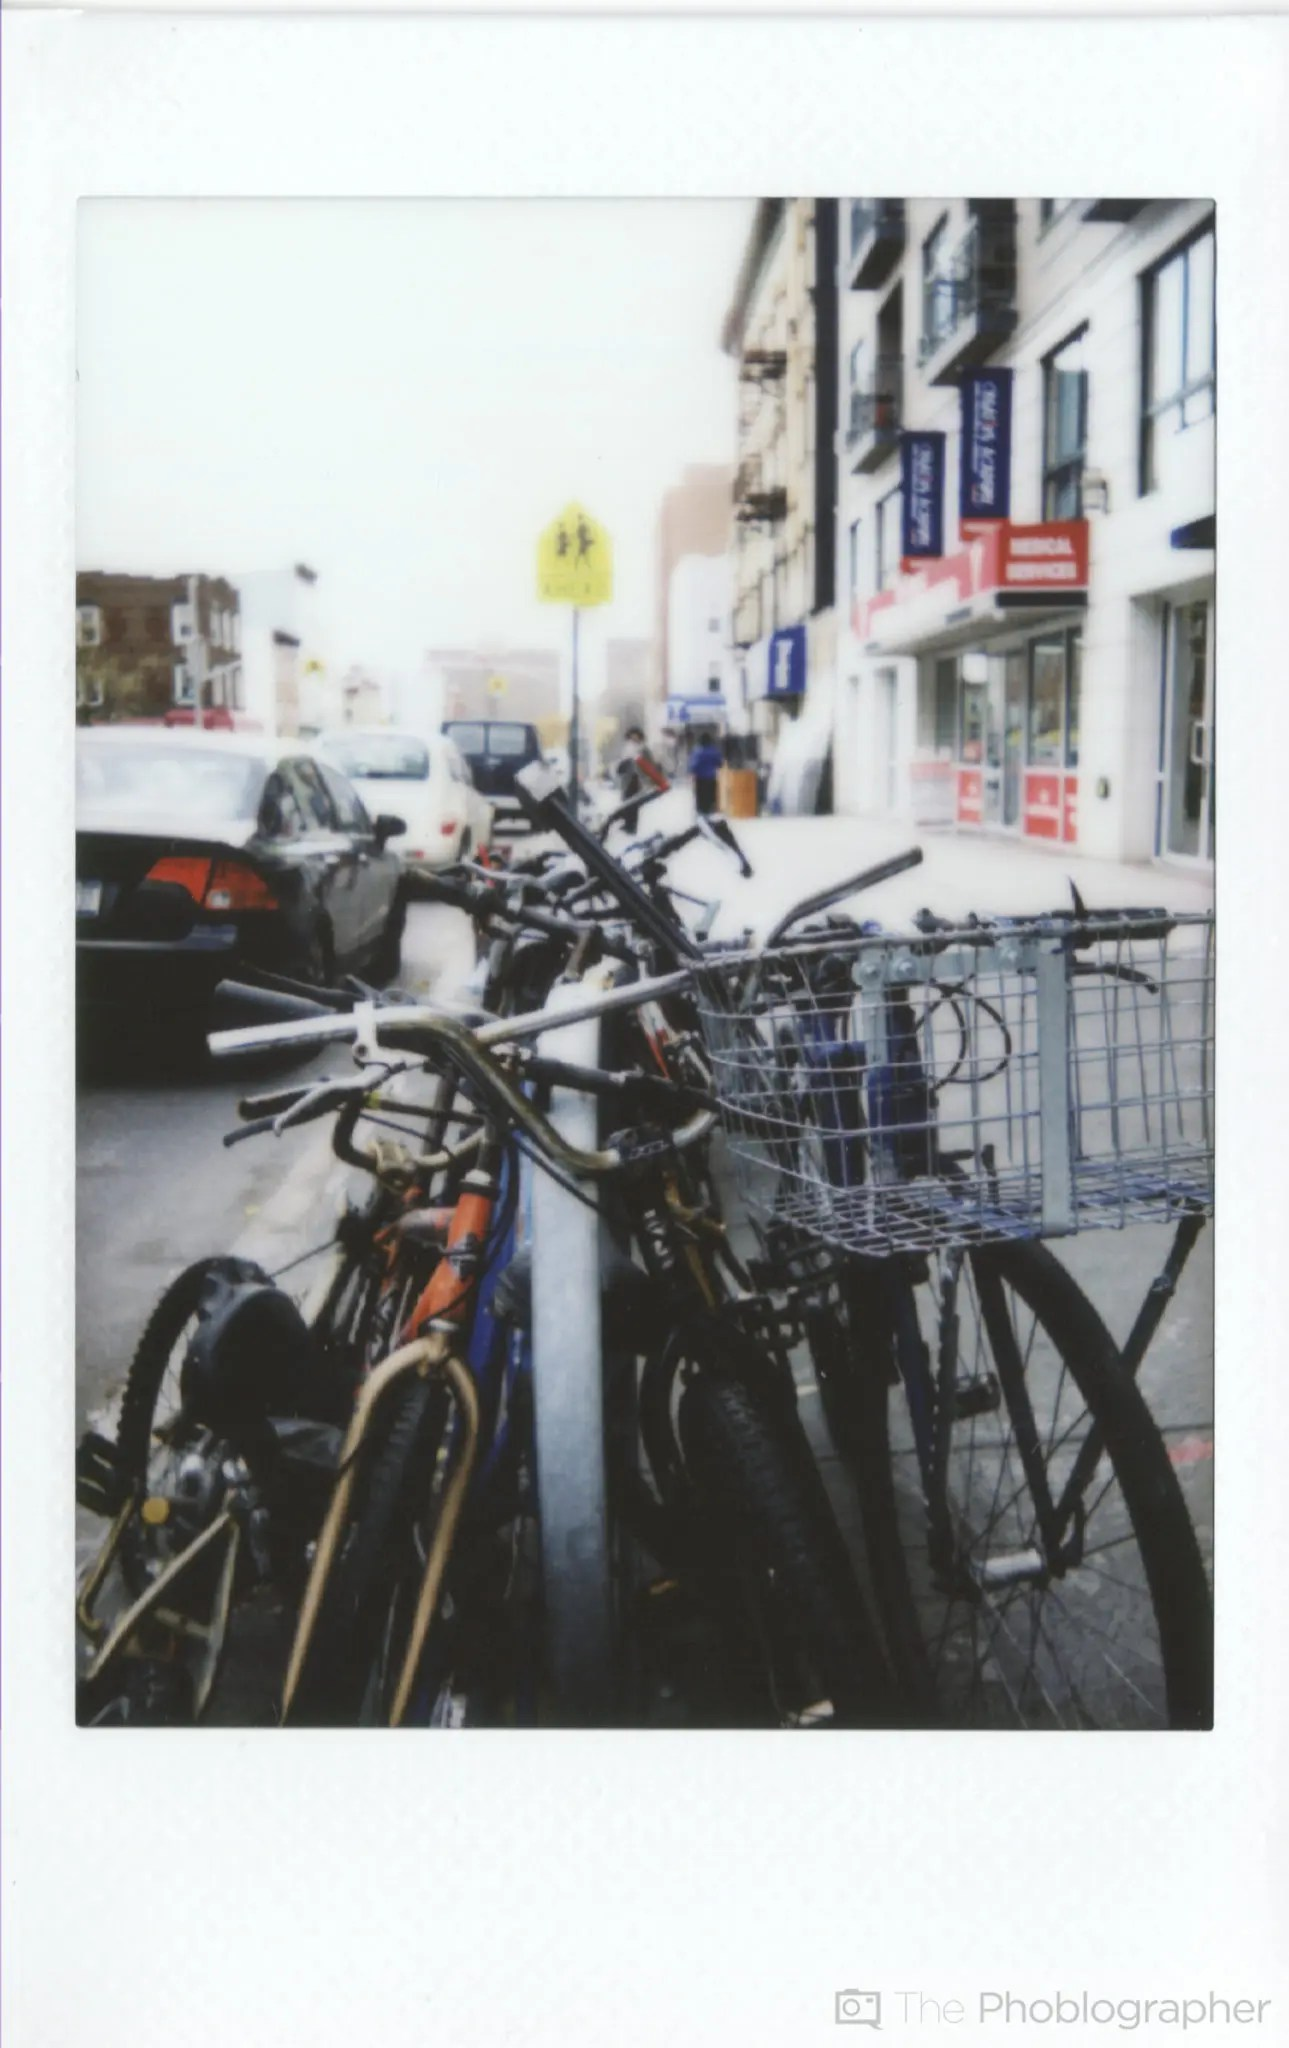 Chris Gampat The Phoblographer Fujifilm Instax Mini 70 scan bikes (1 of 1)